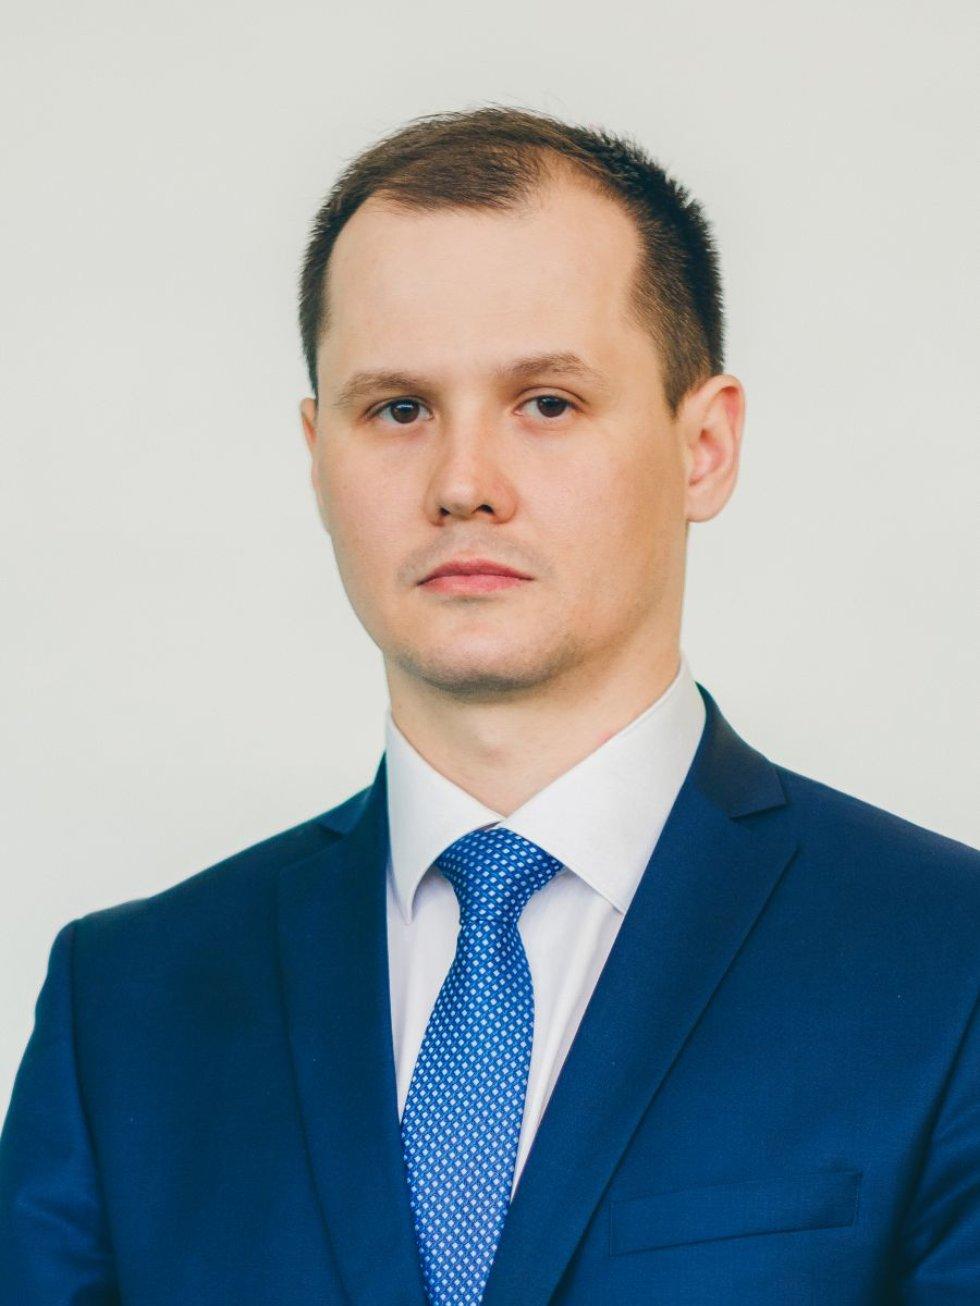 Кузьмин Петр Анатольевич